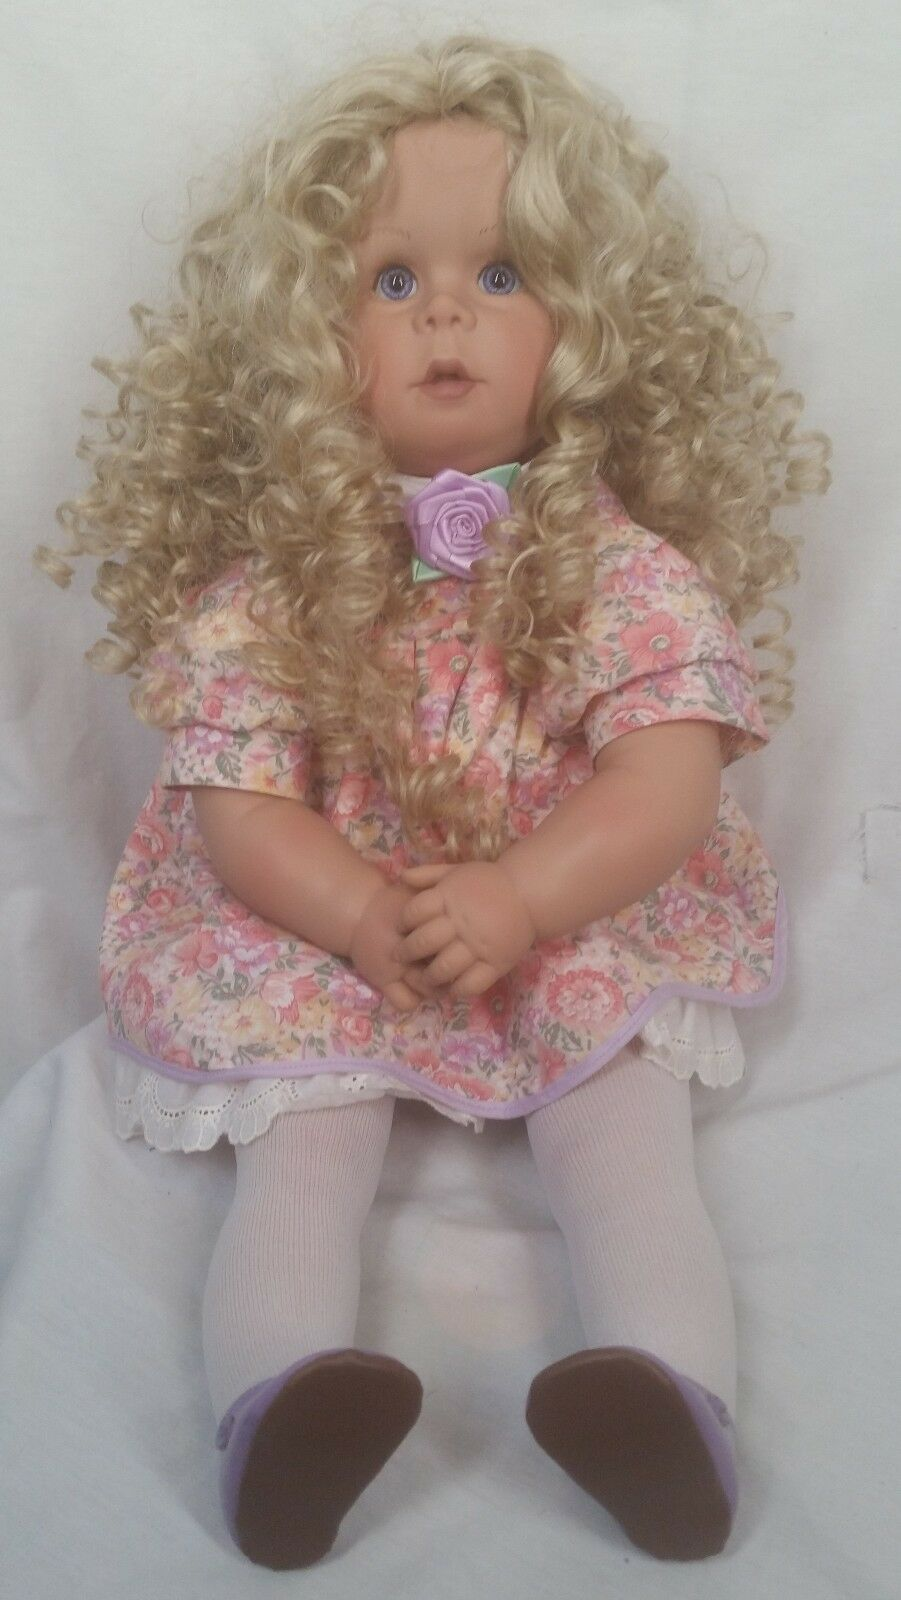 PAT SECRIST JOHANNES ZOOK 1989 SIGNED  287 22  DOLL blonde curly hair dress